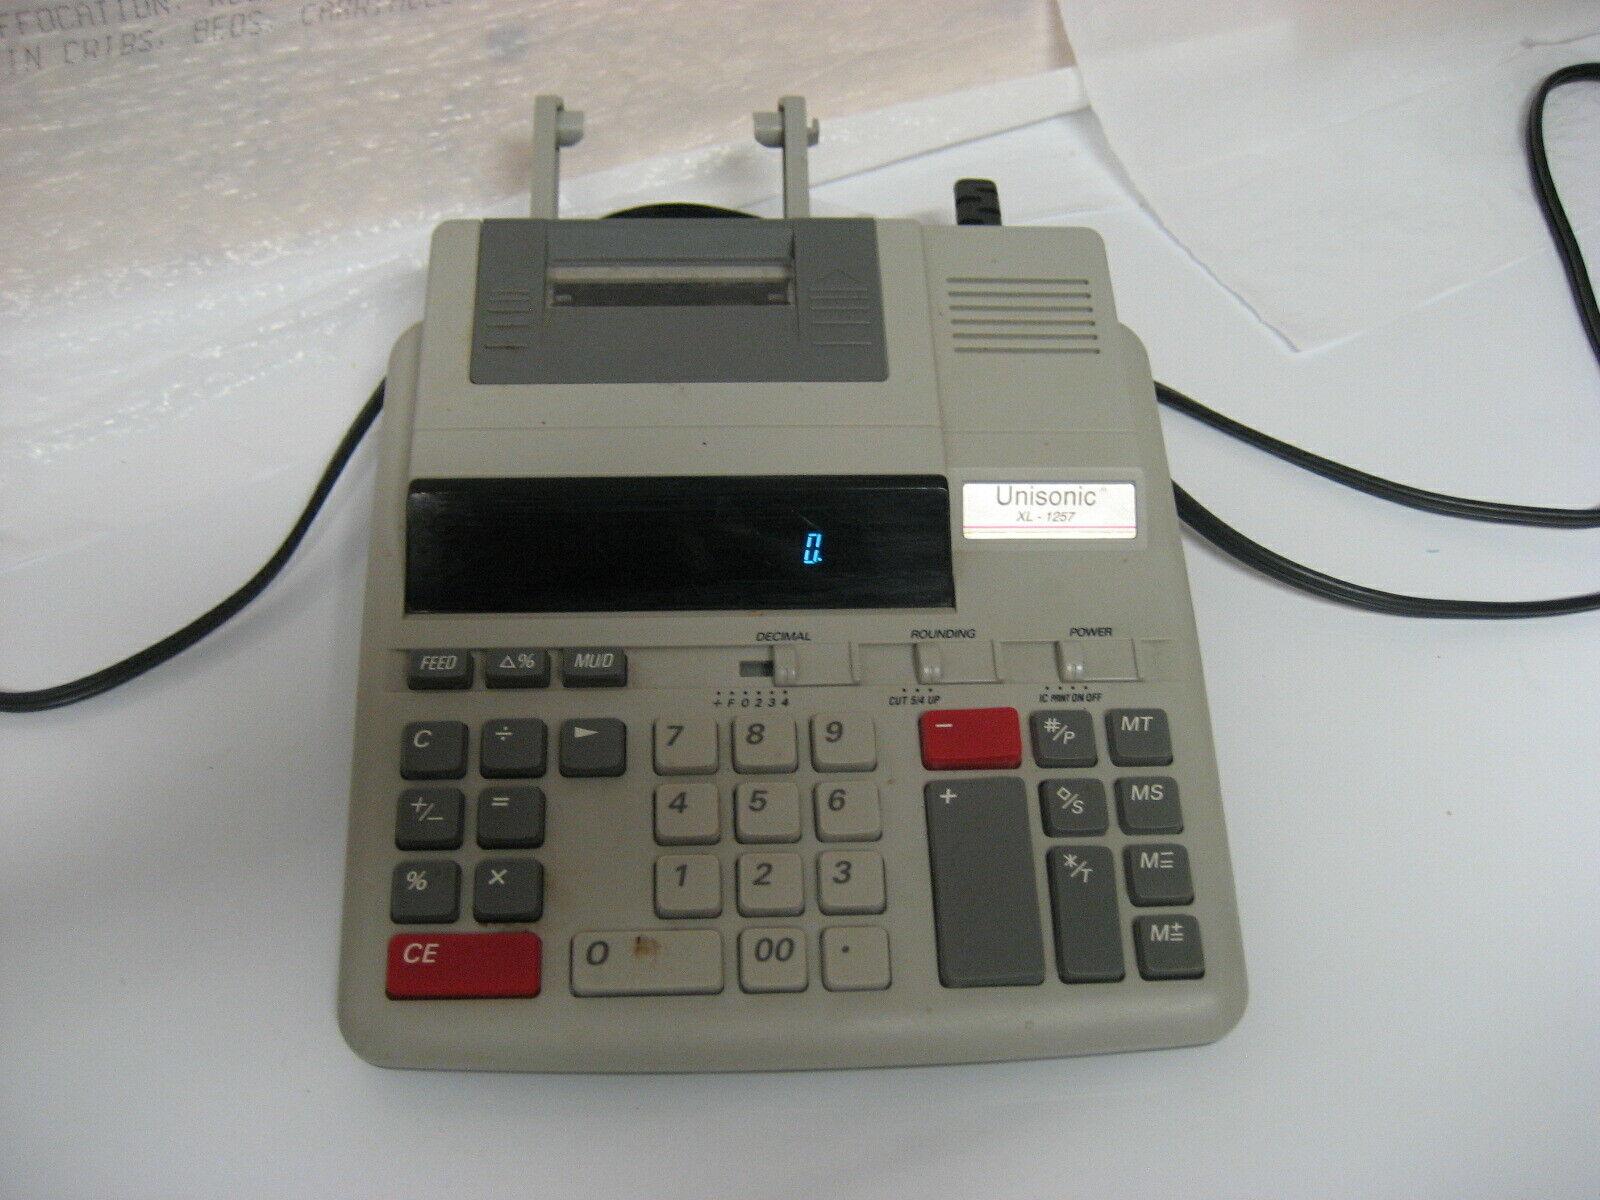 unisonic xl-1257 calculator